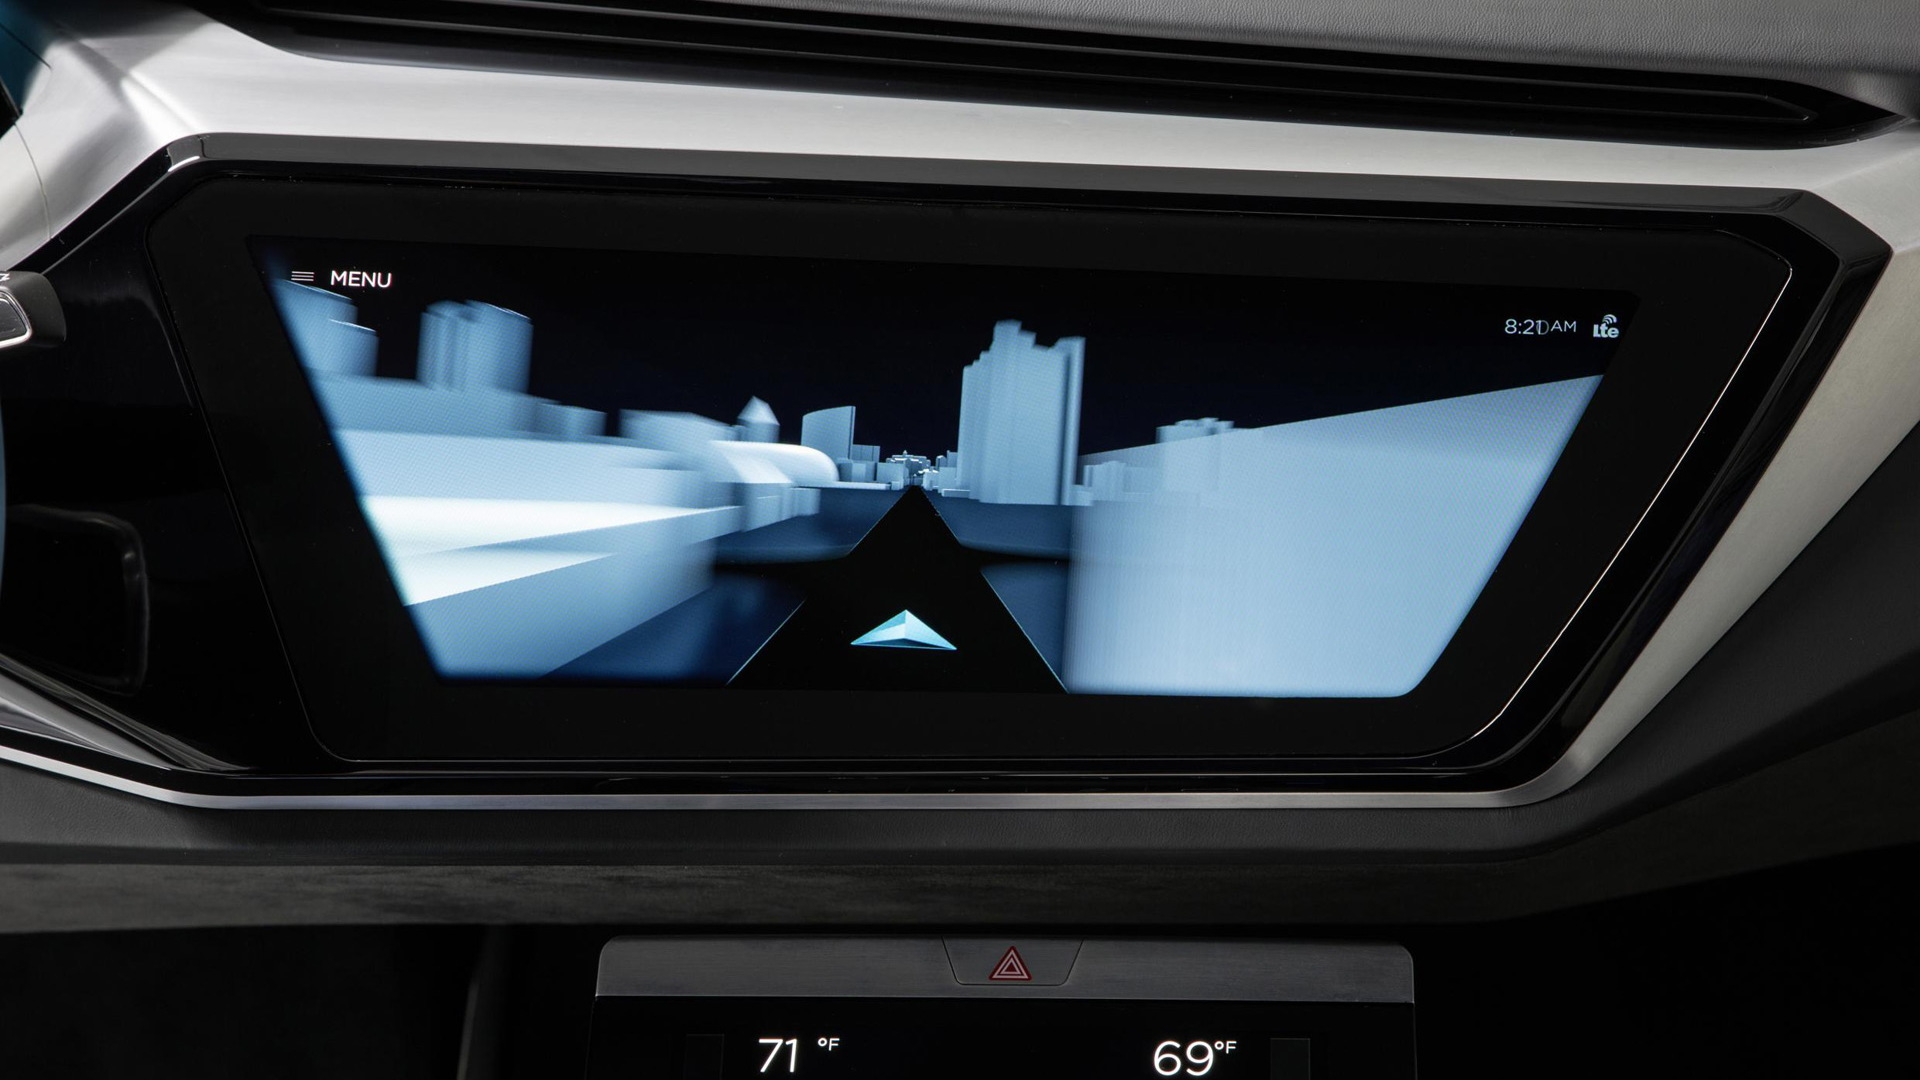 Audi e-tron Quattro concept - 2016 Consumer Electronics Show